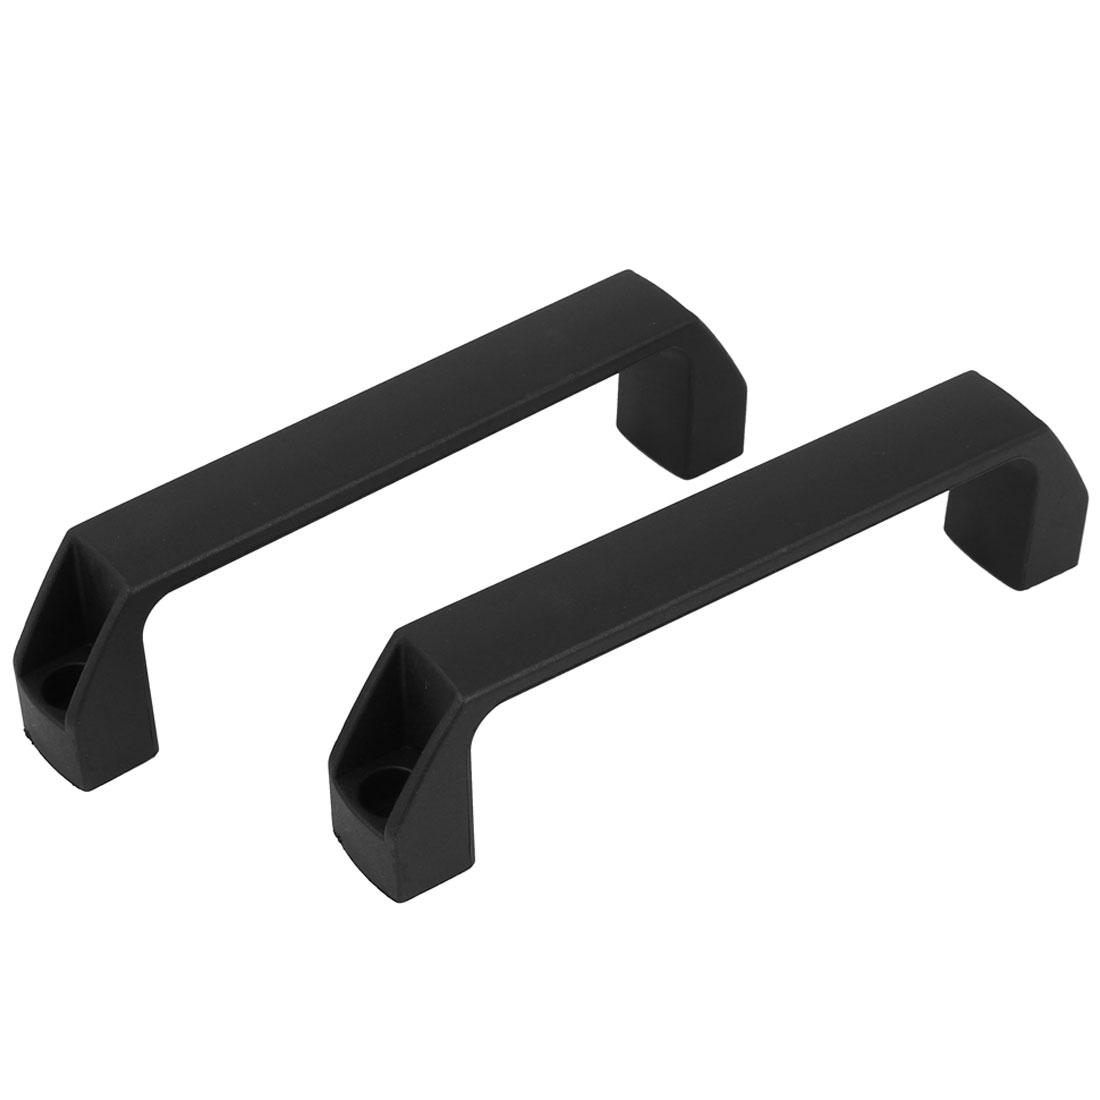 200mm Long Chest Box Plastic Pull Handle Black 2pcs